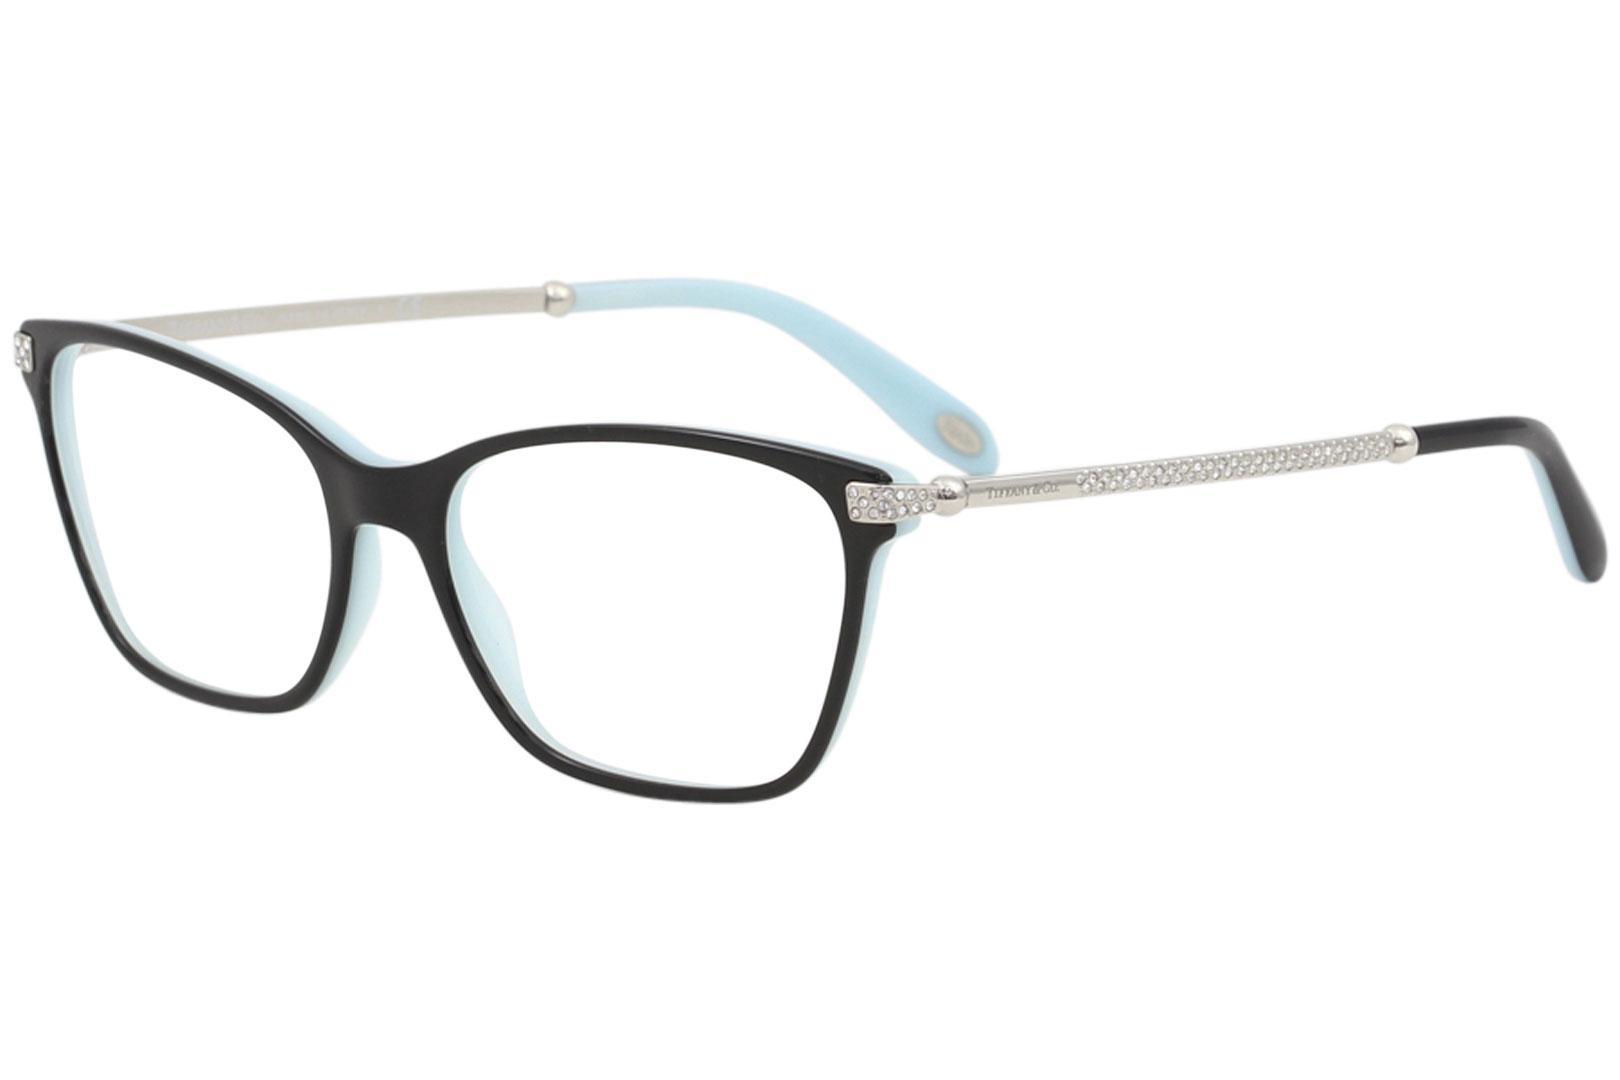 3860827fb48 Tiffany Co Women S Eyeglasses Tf2158b Tf 2158 B Full Rim Optical Frame